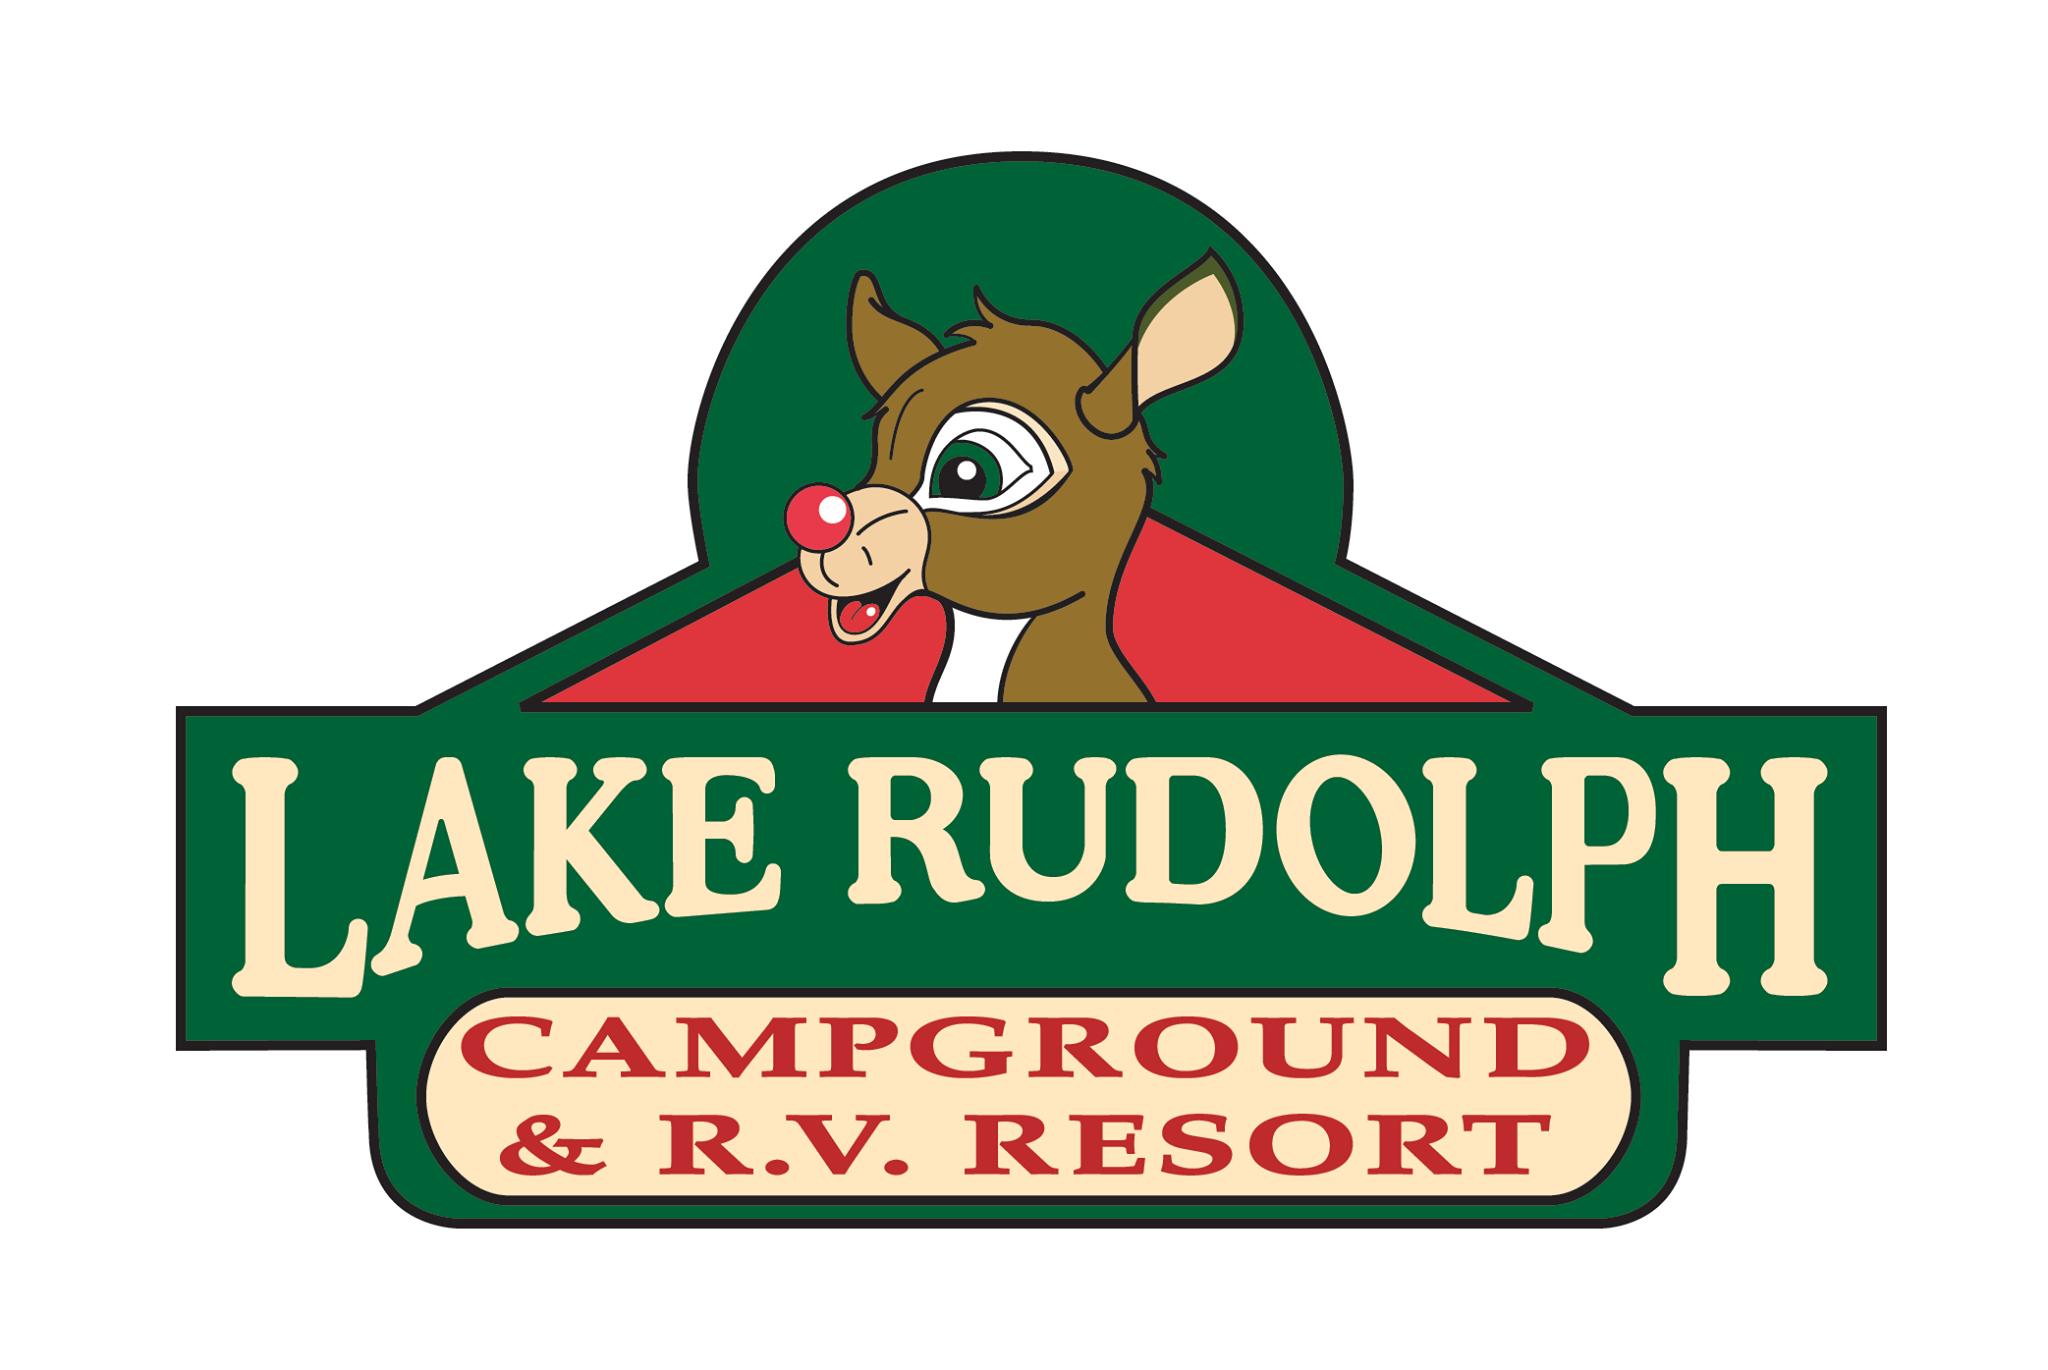 Travel Tuesday Featured Destination: Lake Rudolph Campground & RV Resort